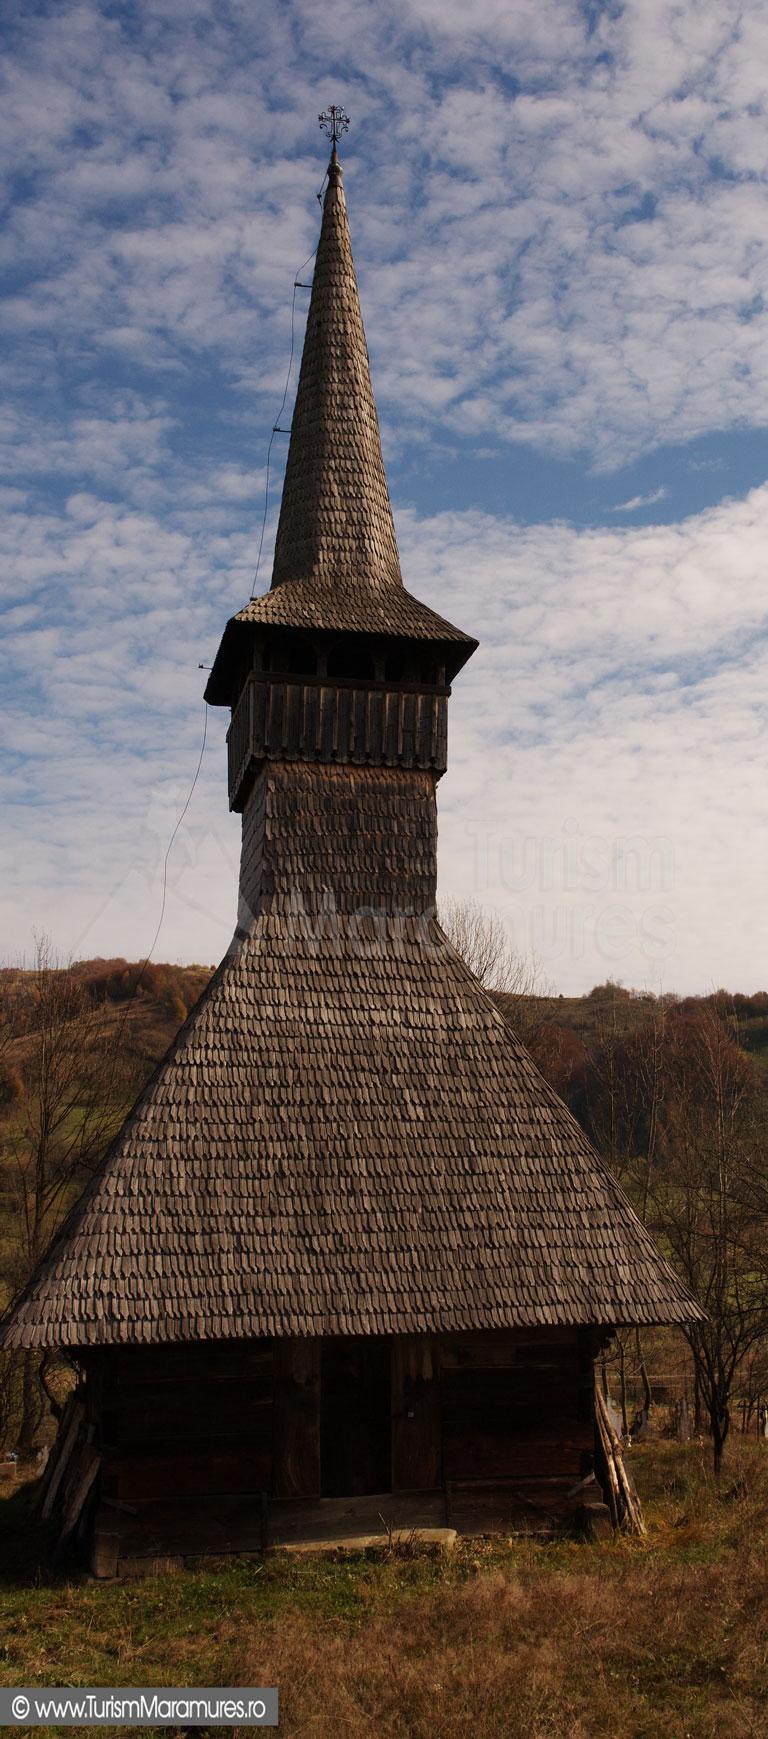 04_-Biserica-Sfintii-Arhangheli-Ungureni